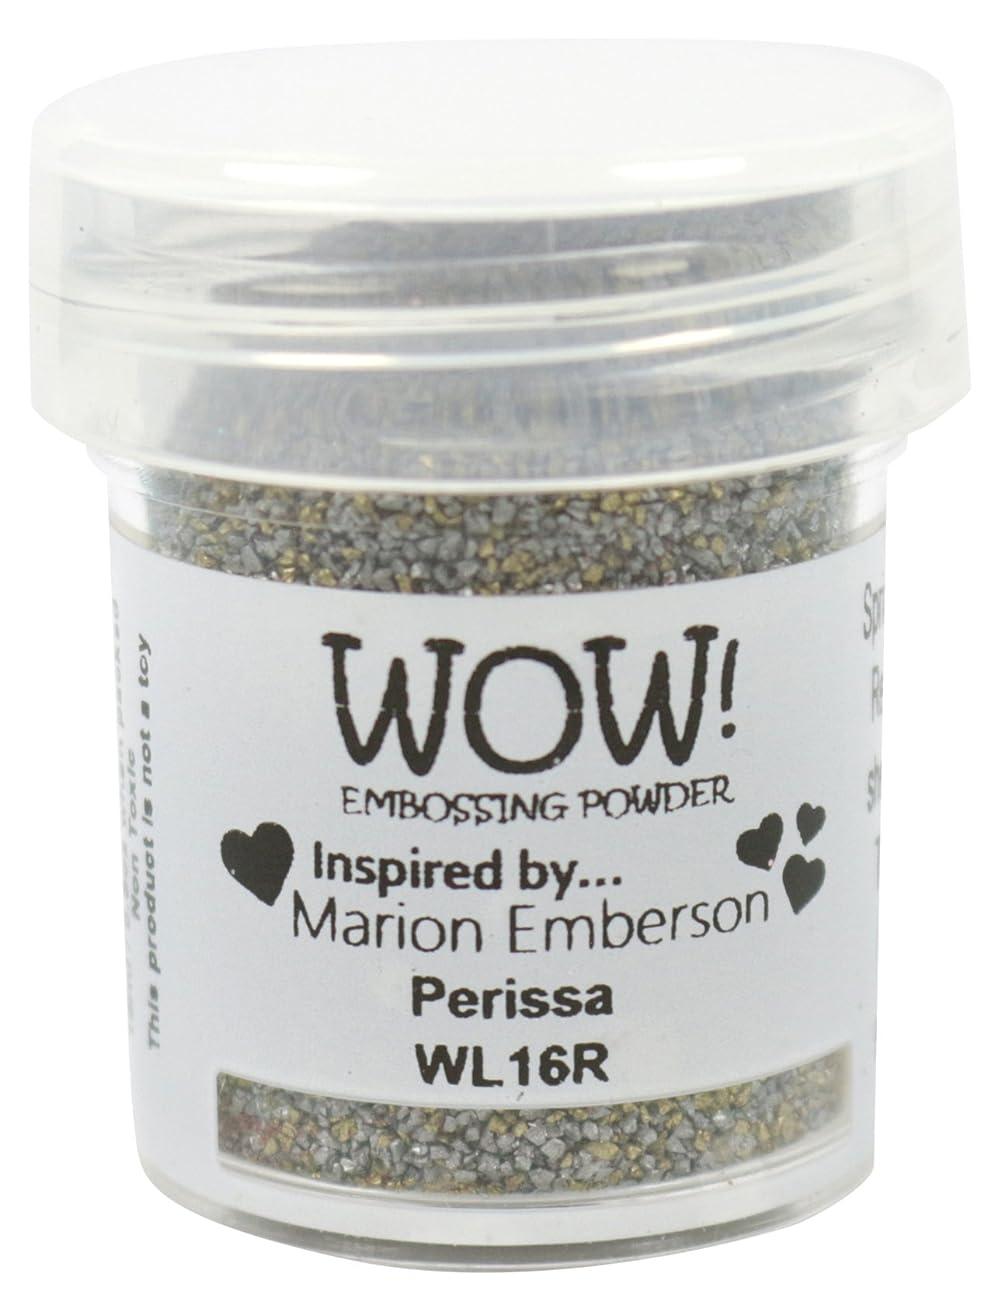 Wow Embossing Powder WL16R 15ml-Perissa